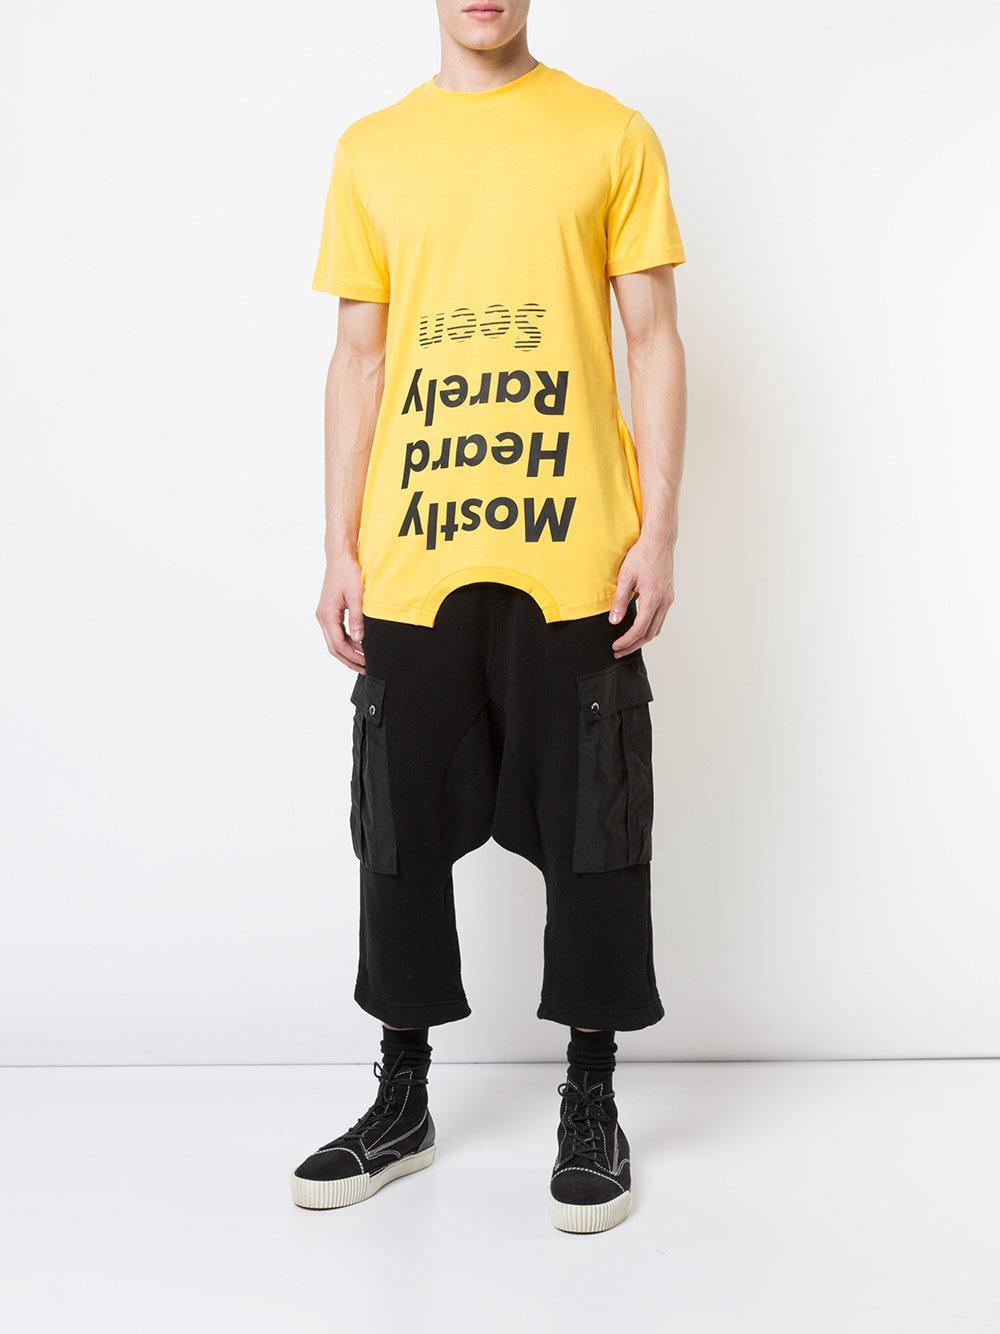 4da5cb8d mostly-heard-rarely-seen-Yellow-Orange-Should-Be-Higher-T-shirt.jpeg